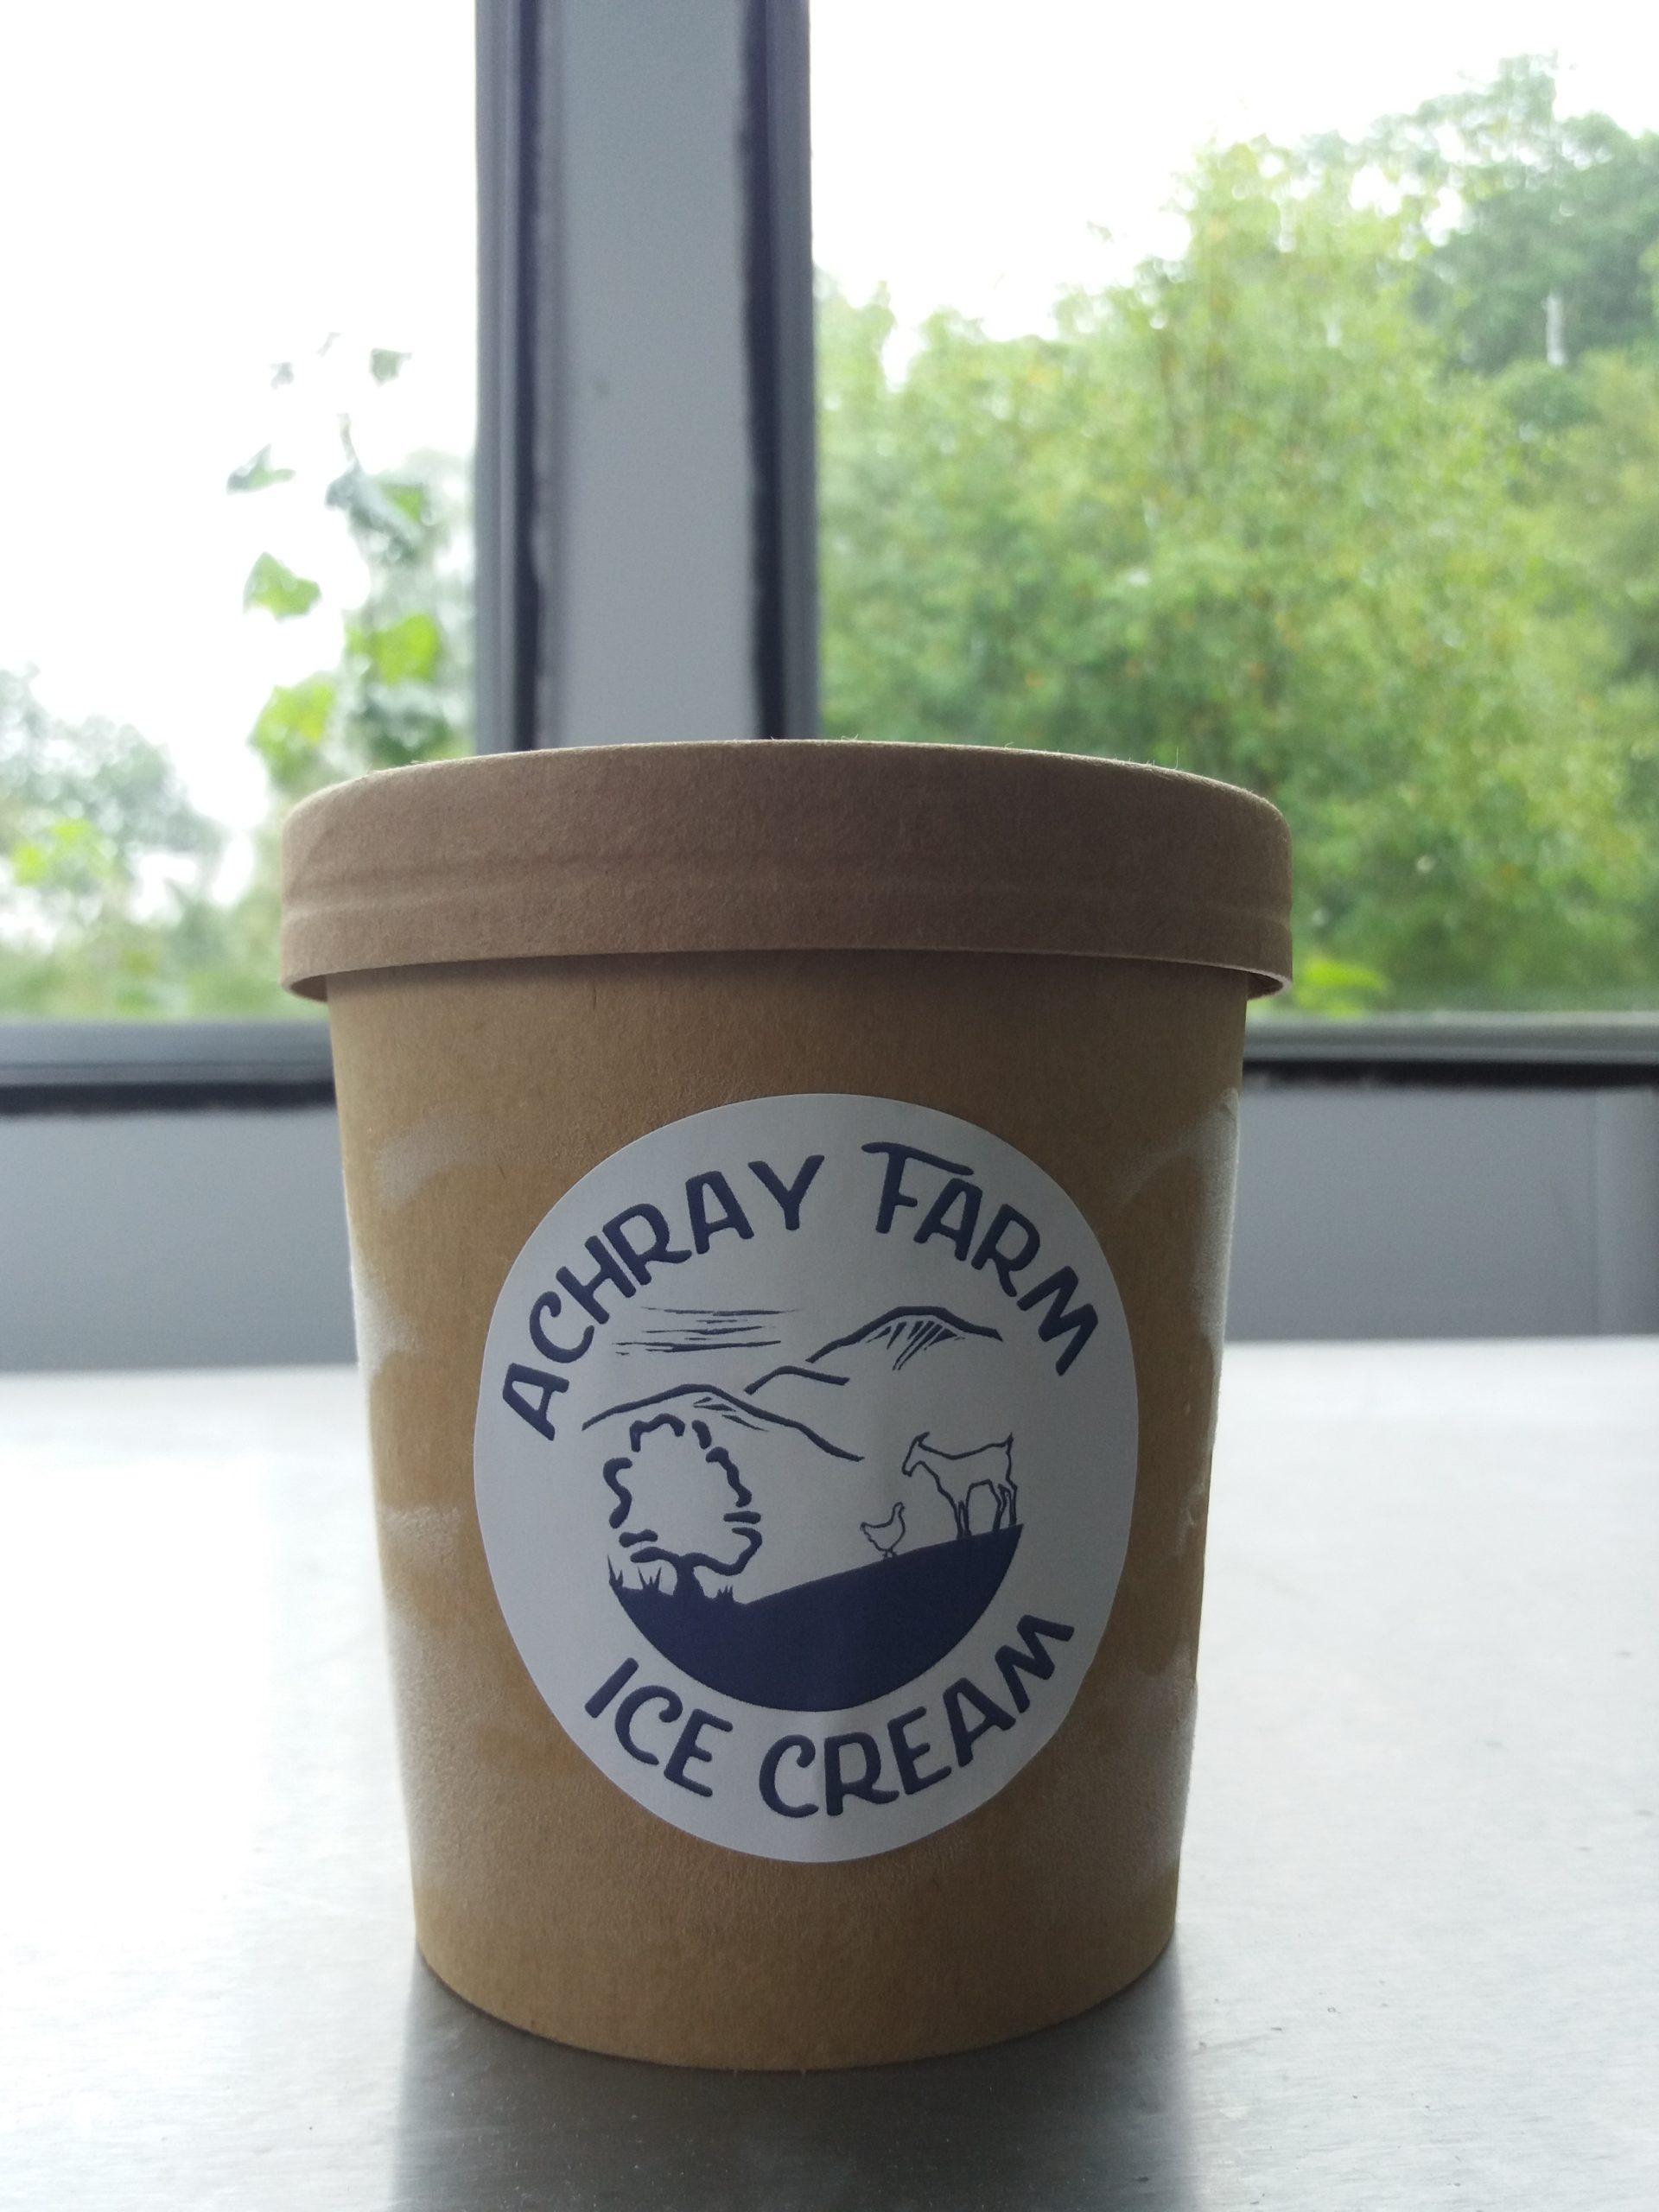 Achray Farm Ice Cream